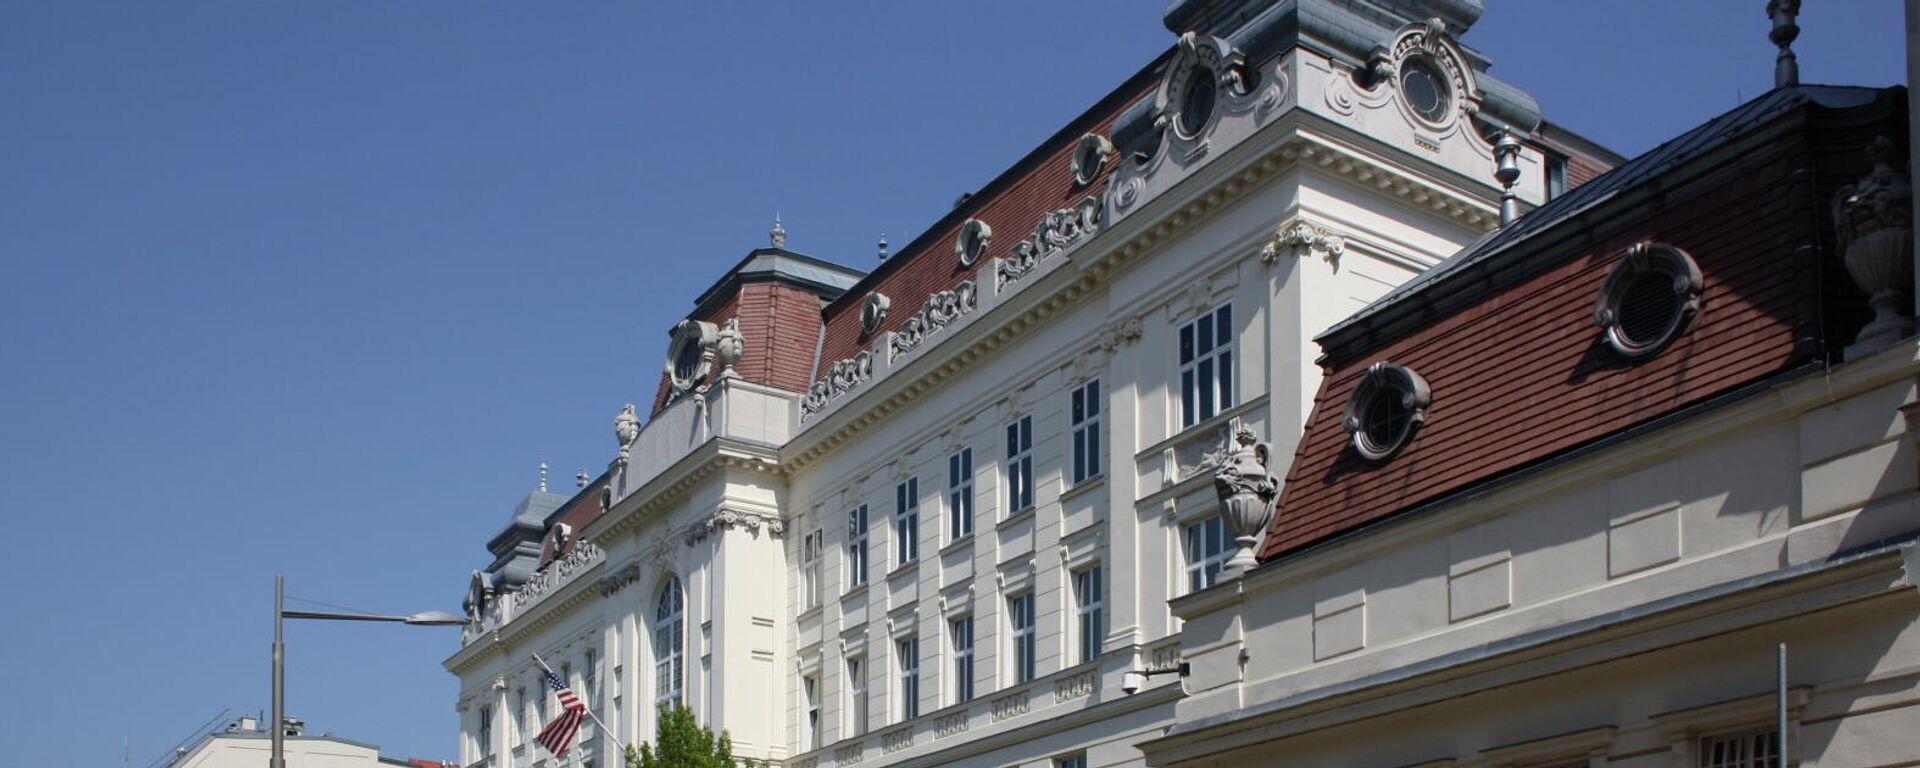 La embajada de EEUU en VIena, foto de archivo - Sputnik Mundo, 1920, 18.07.2021